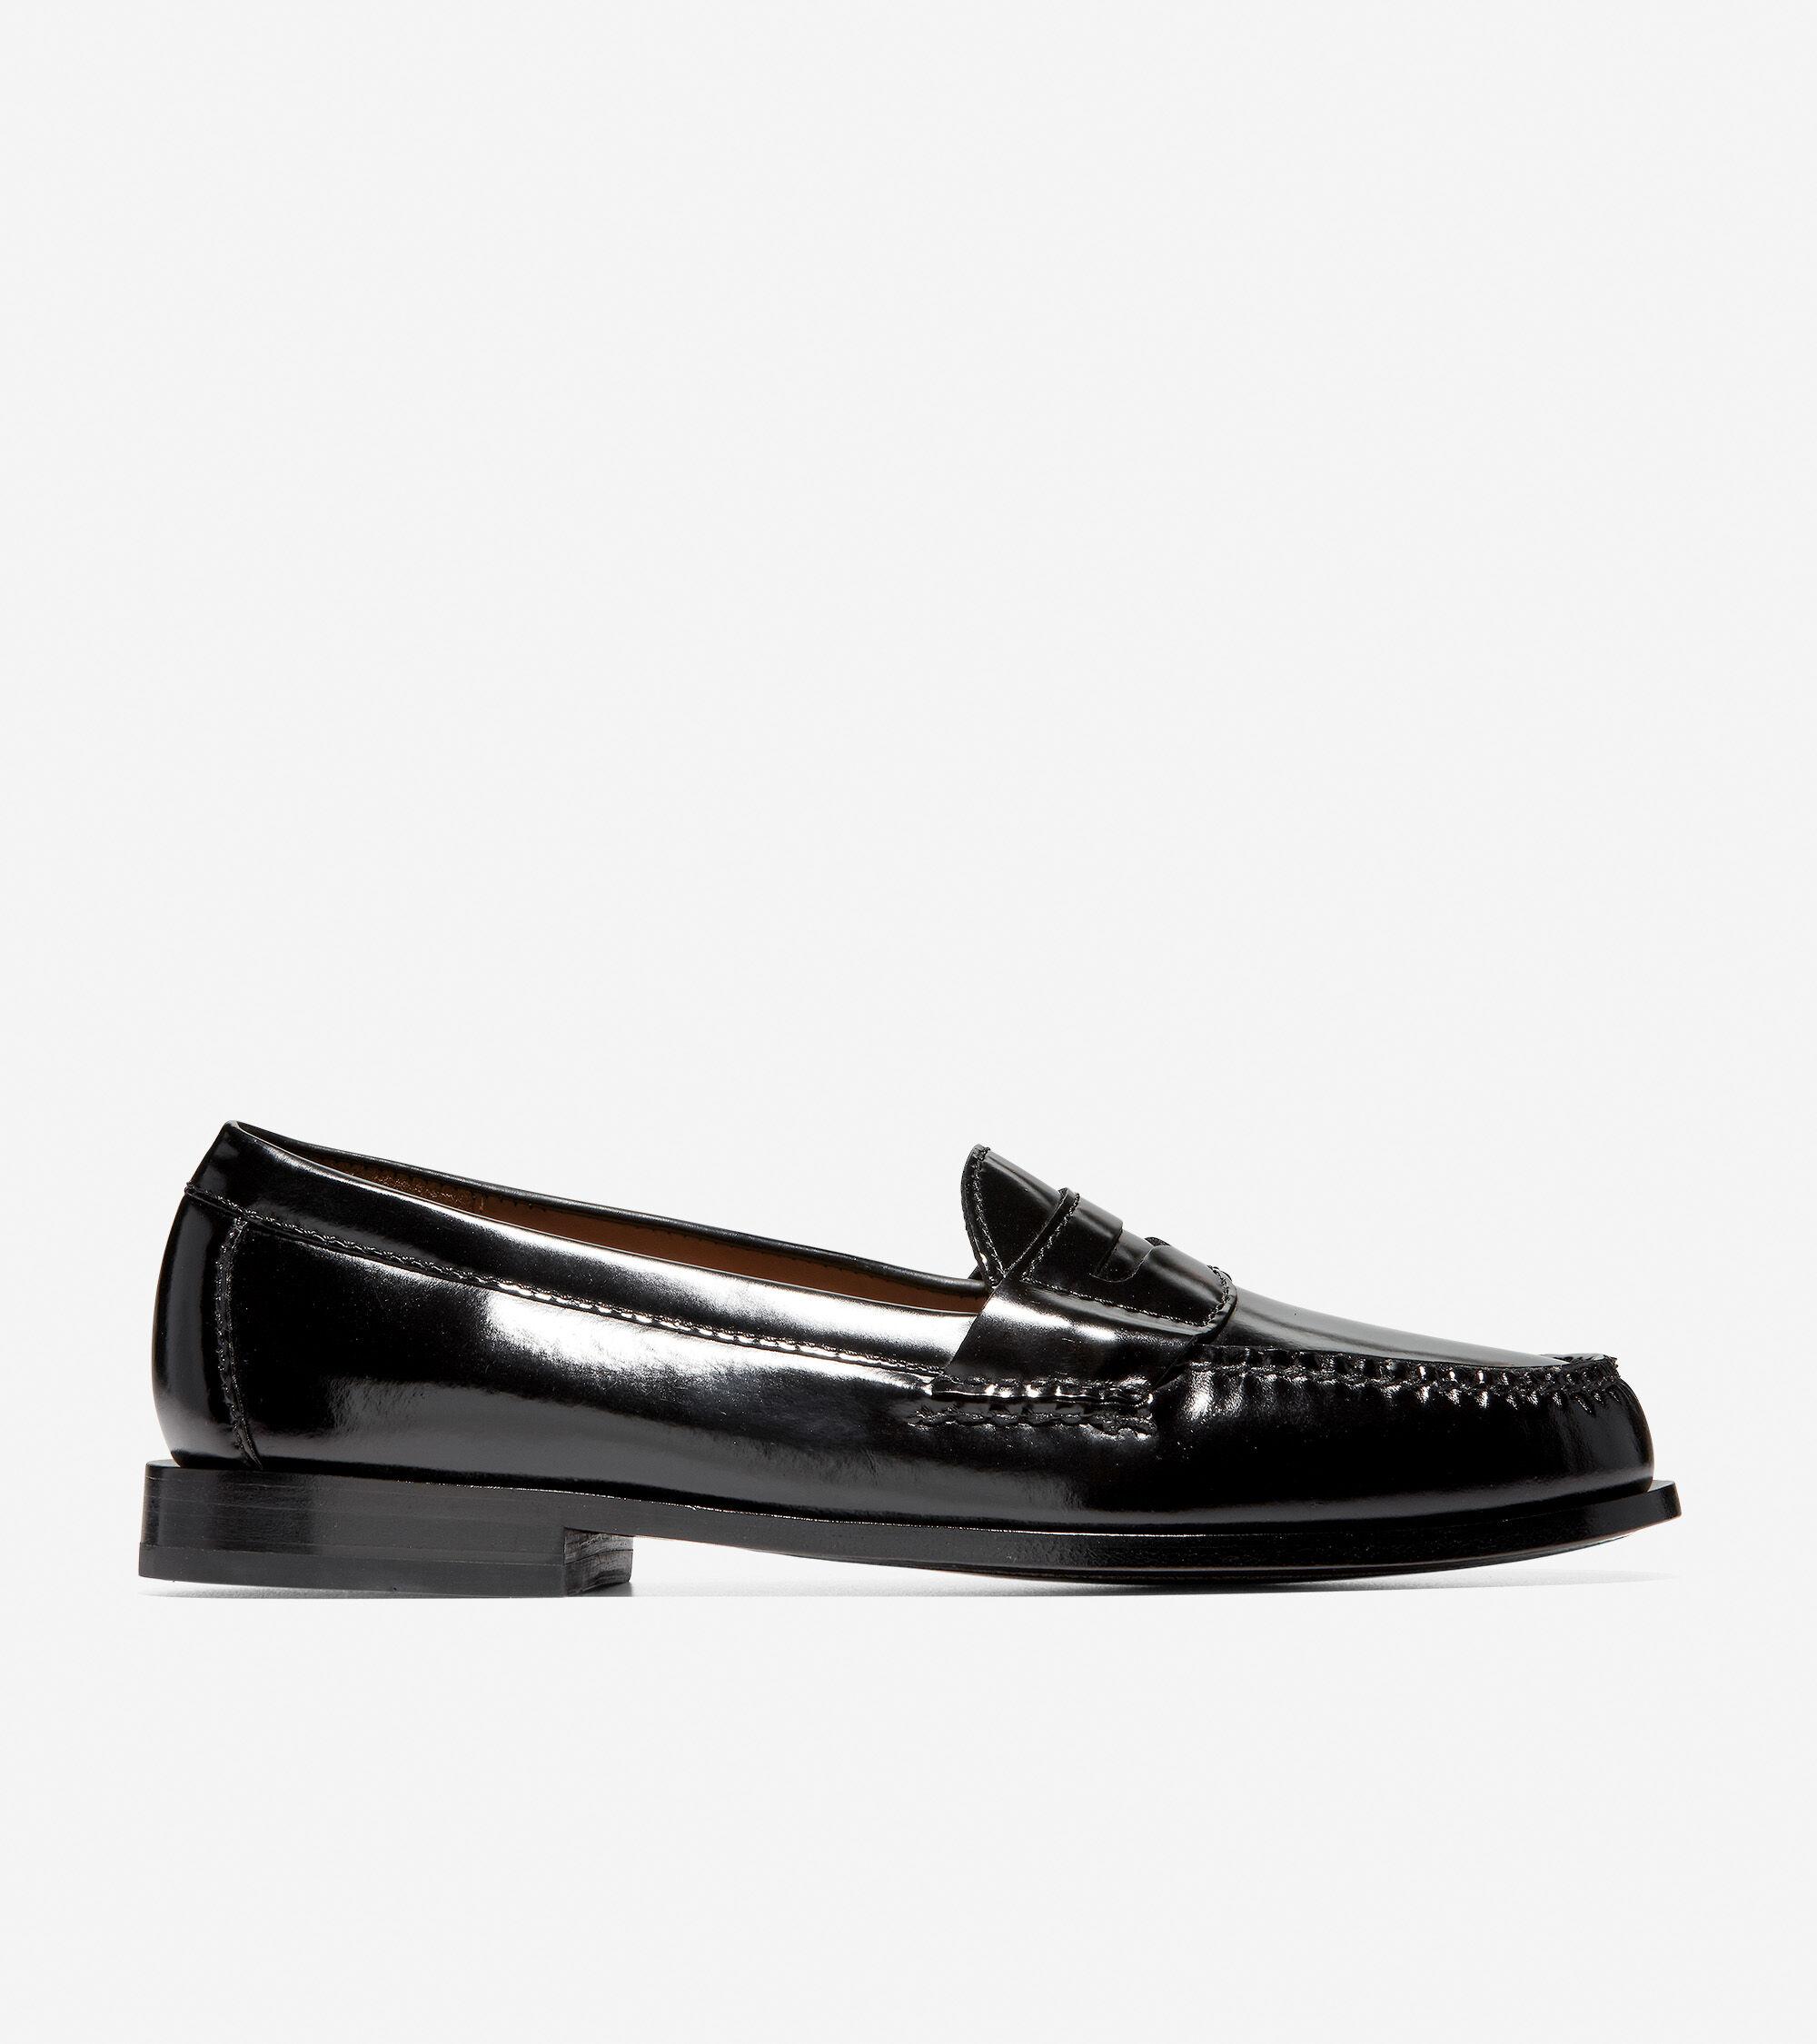 Men's Pinch Penny Loafer in Black